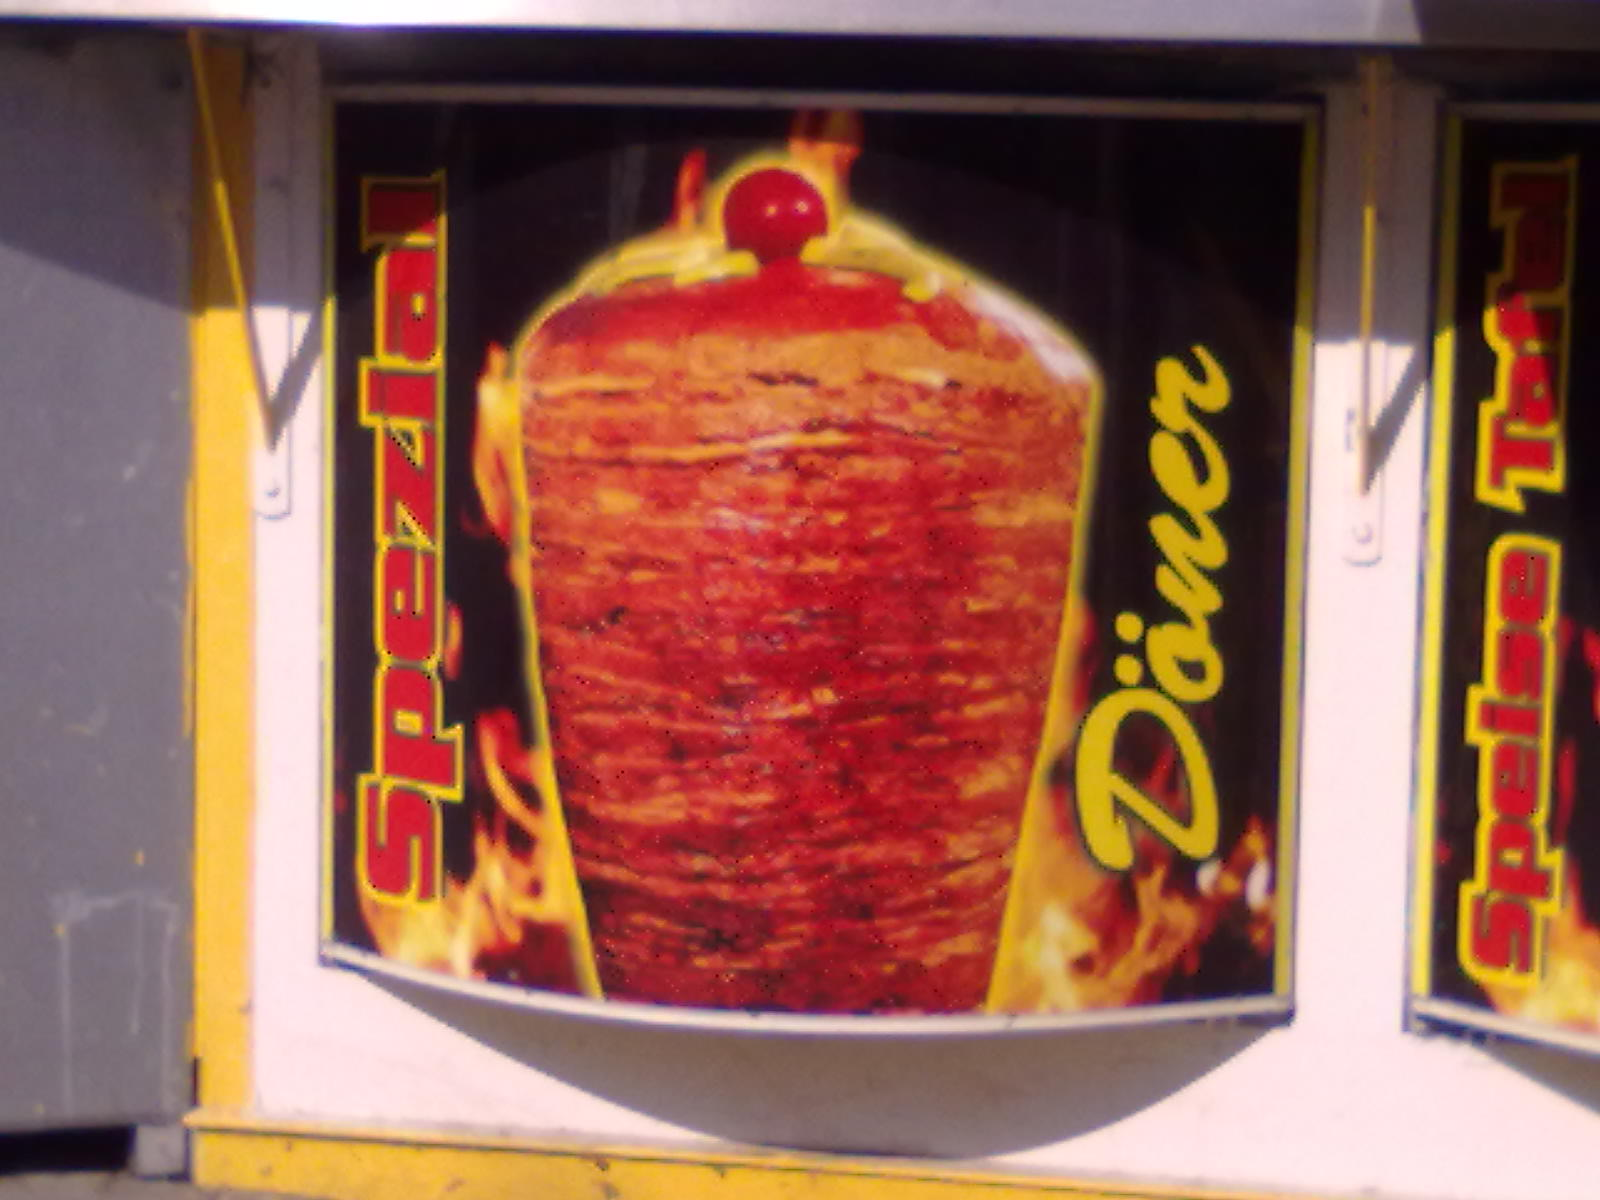 Chili Peppers Döner Lieferservice in 44143 Dortmund Wambel, Körne und Umgebung